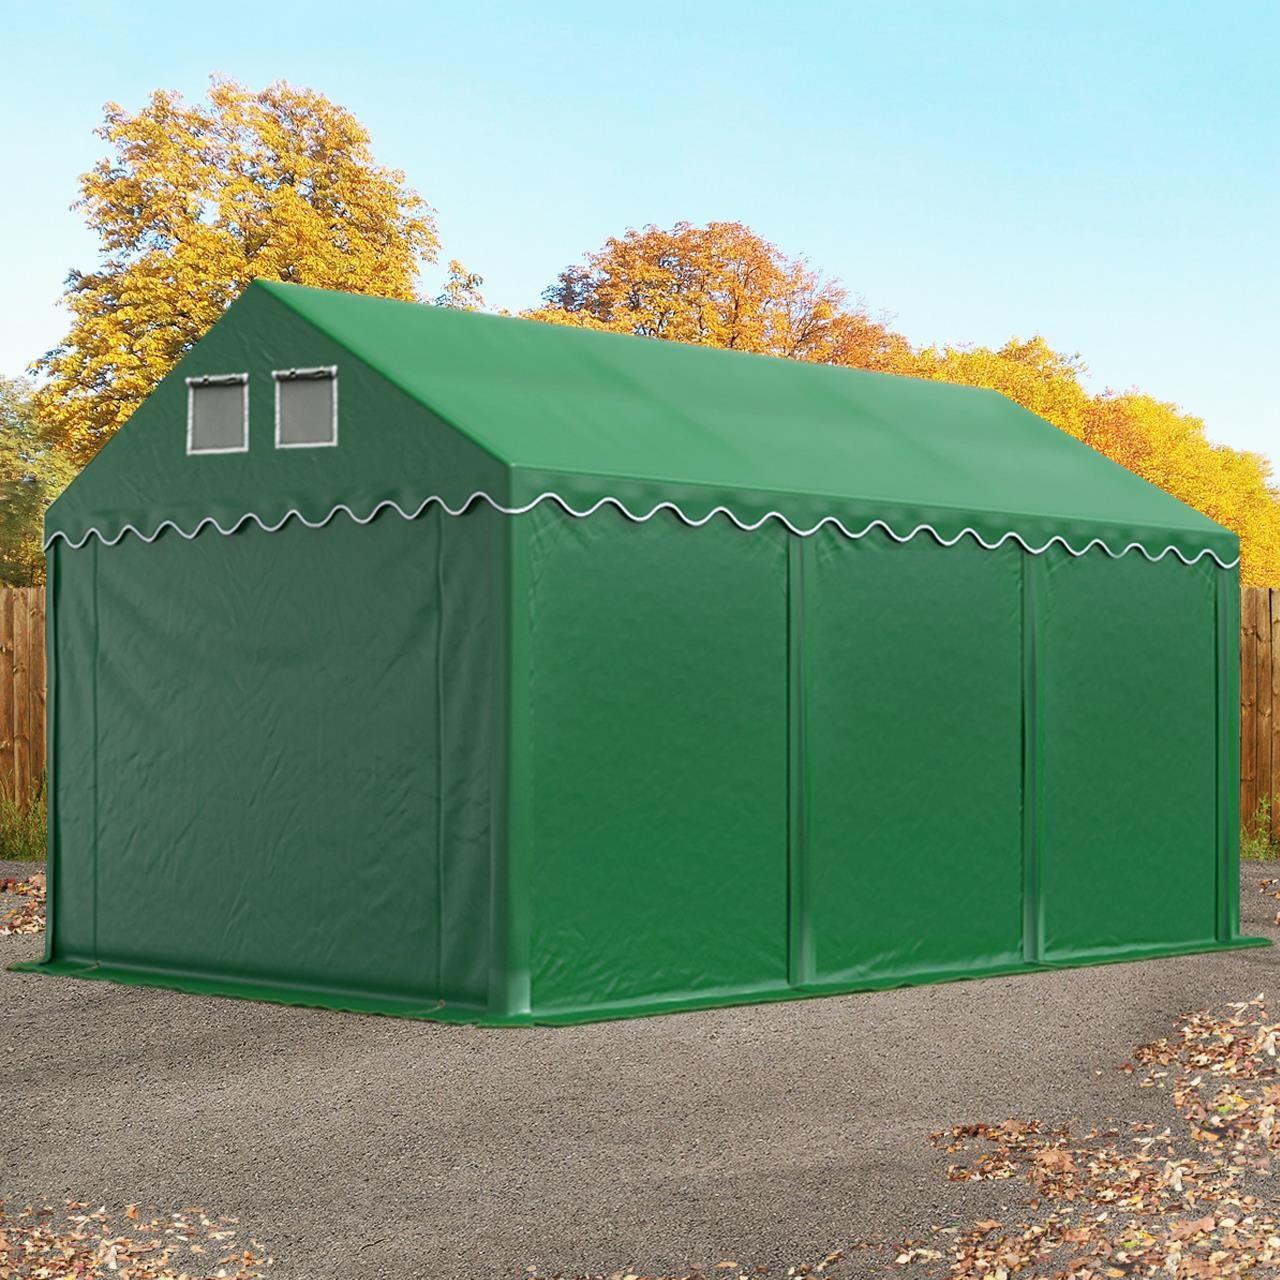 2,4x3,6m Namiot garażowy PE ciemnozielony Profinamiot